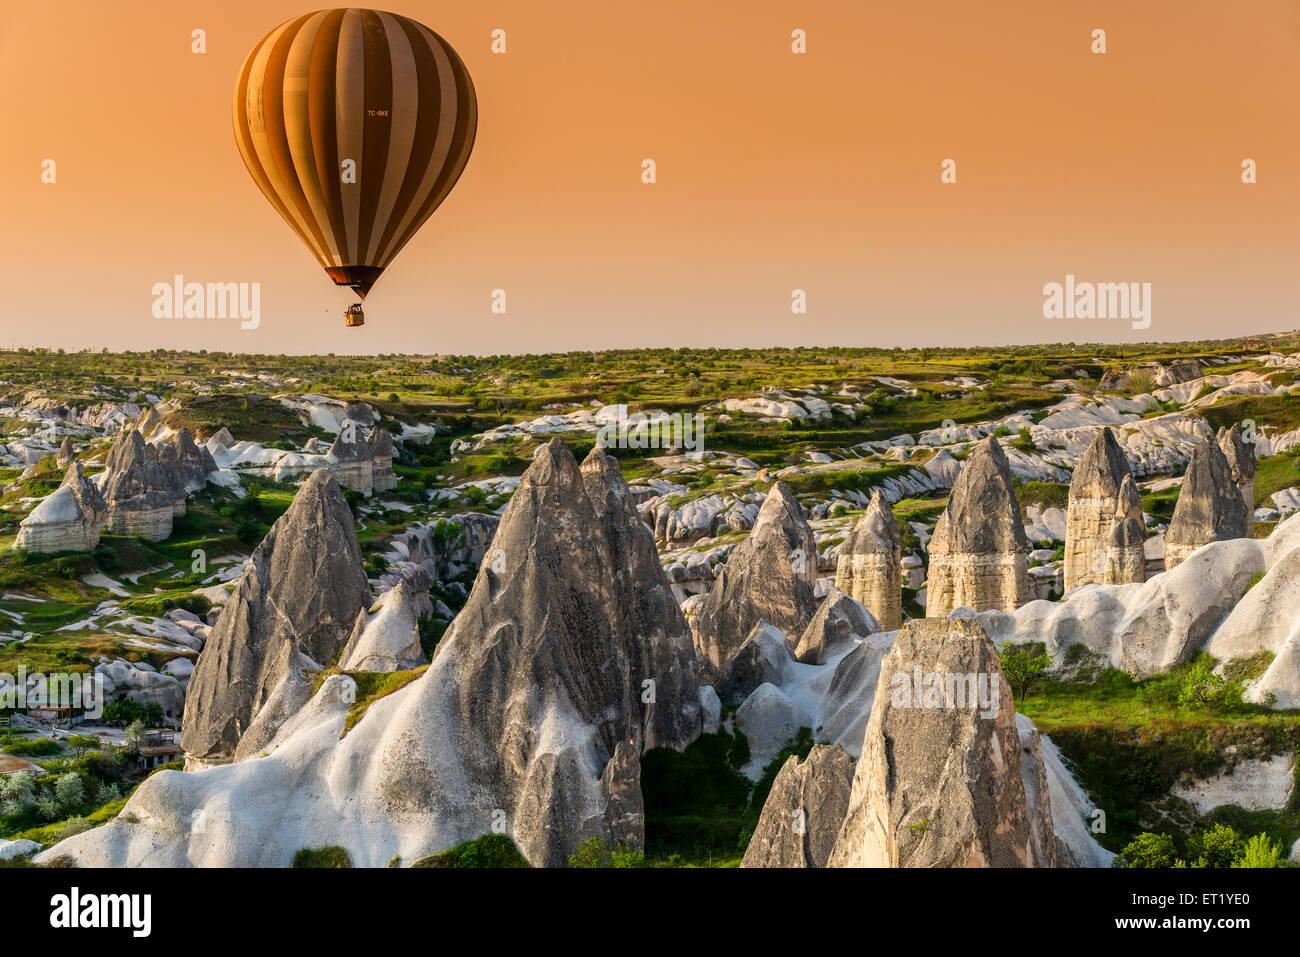 Sunrise landscape with hot air balloon, Goreme, Cappadocia, Turkey Stock Photo